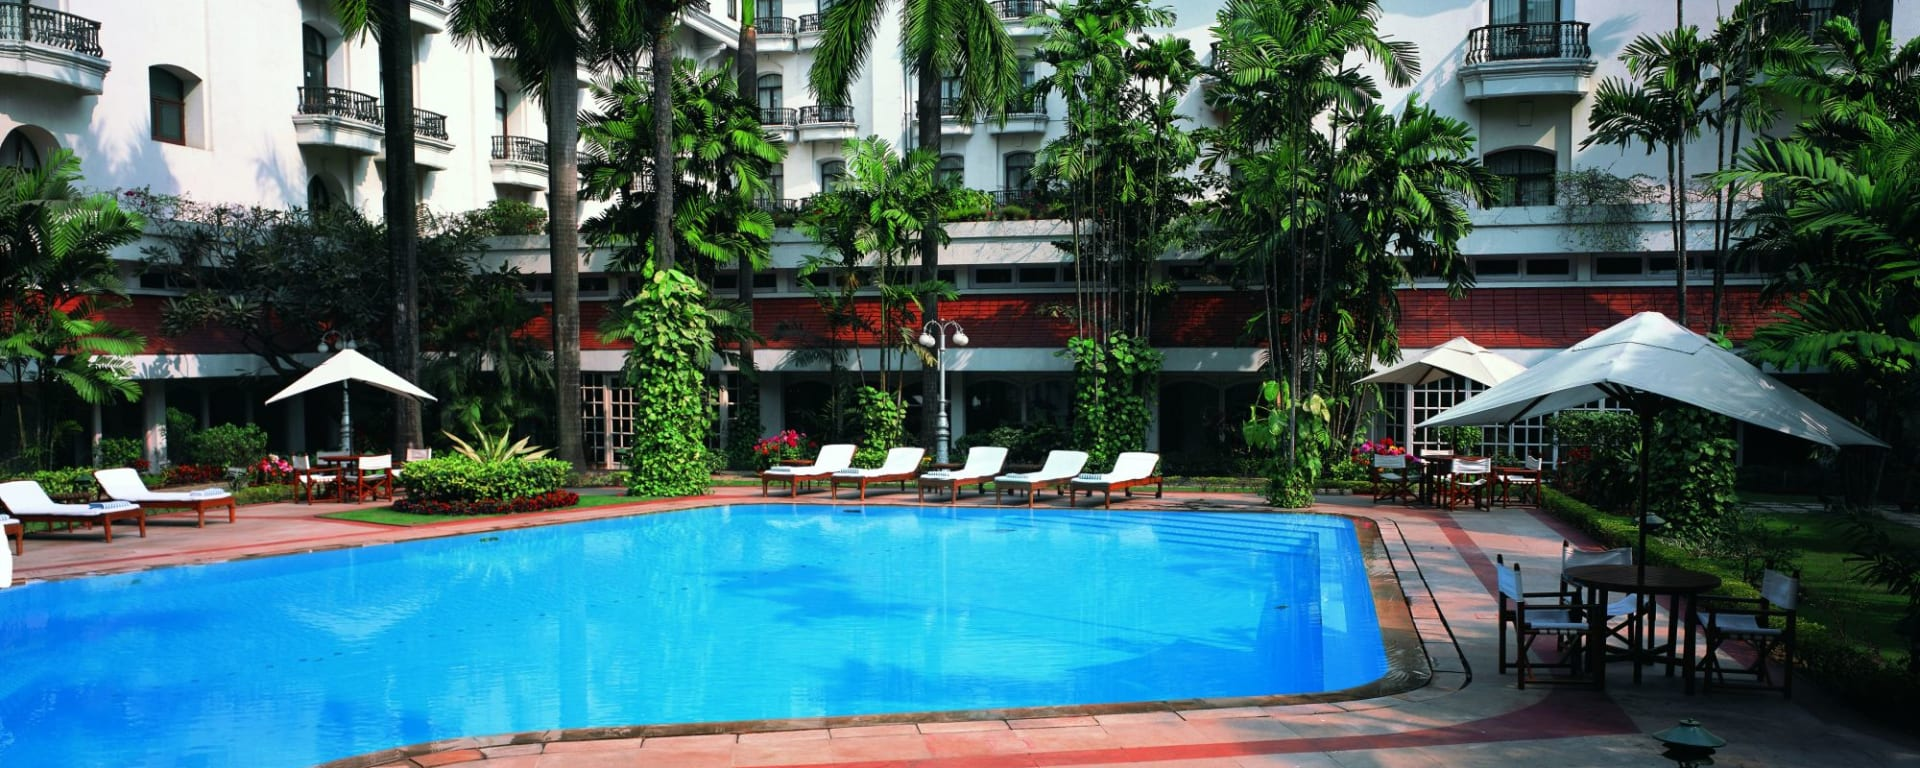 The Oberoi Grand à Kolkata: Pool